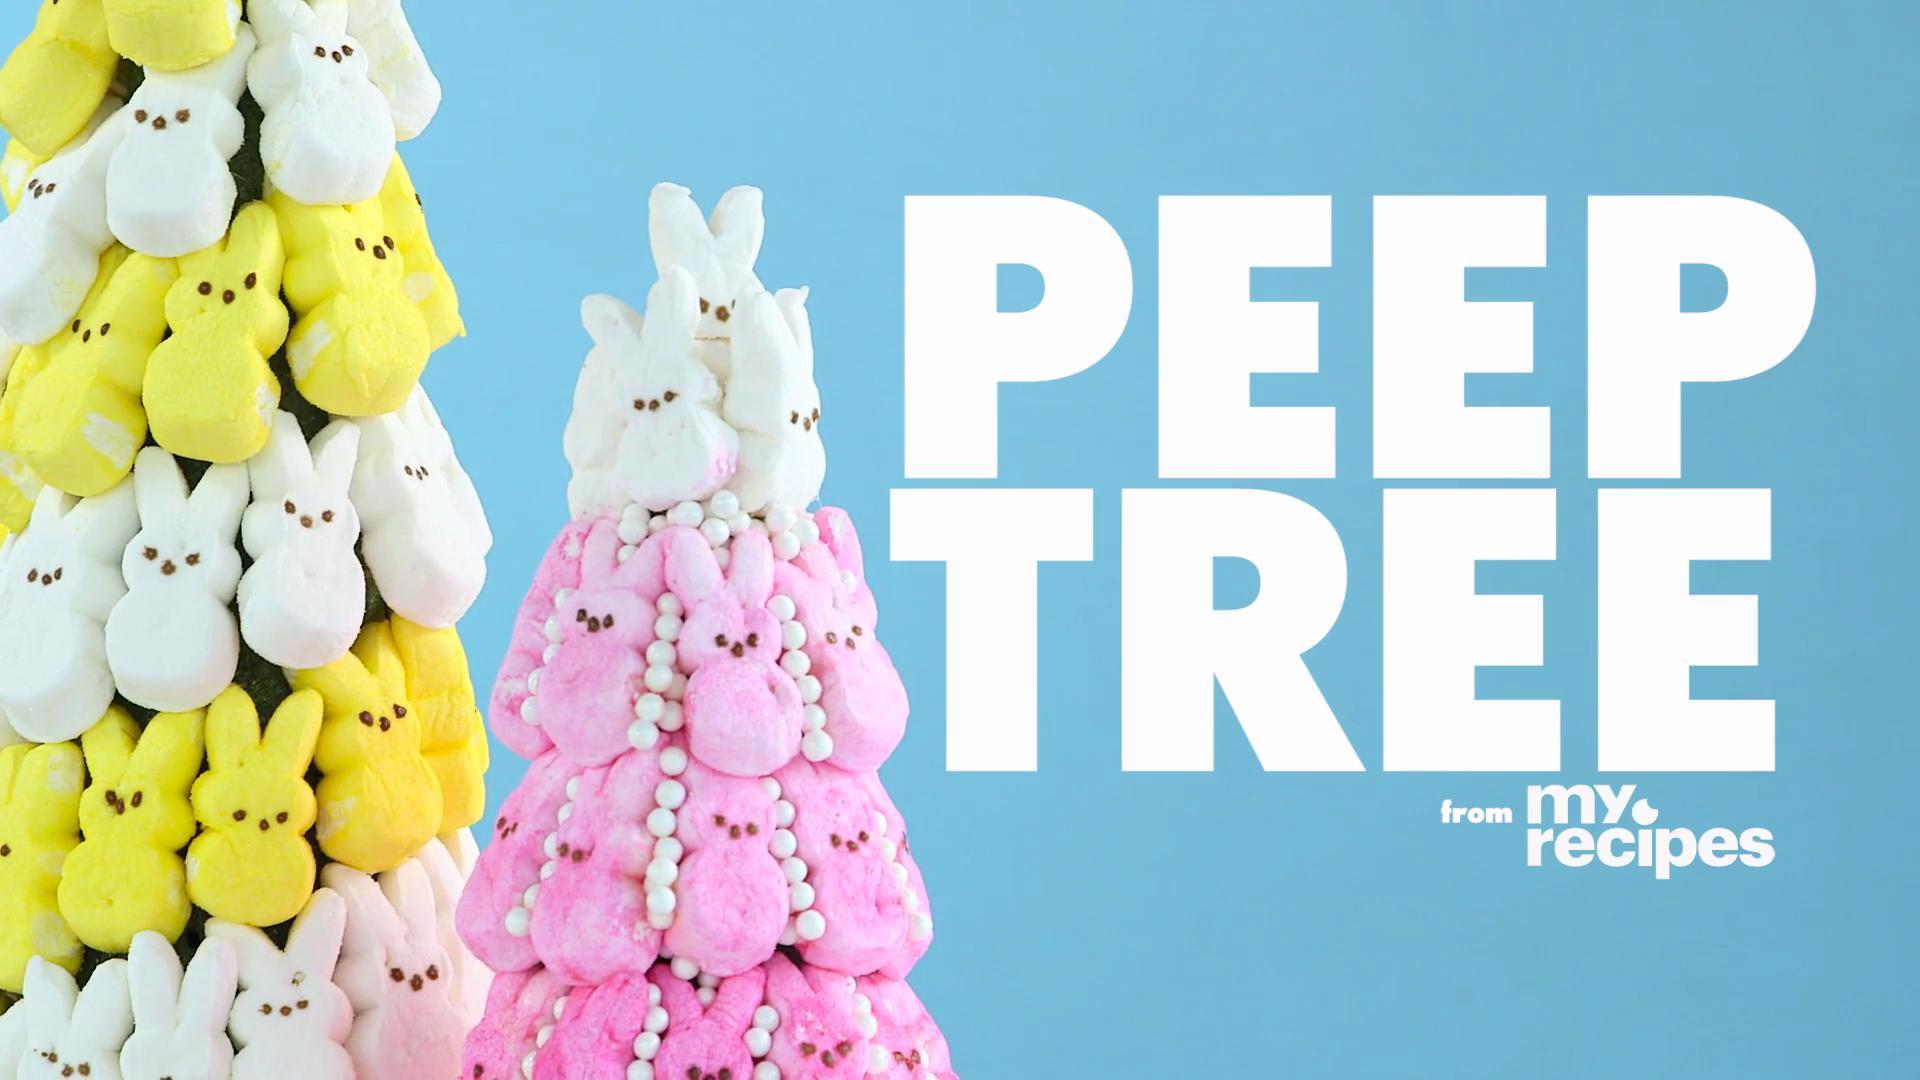 How to Make an Easter Peep Tree